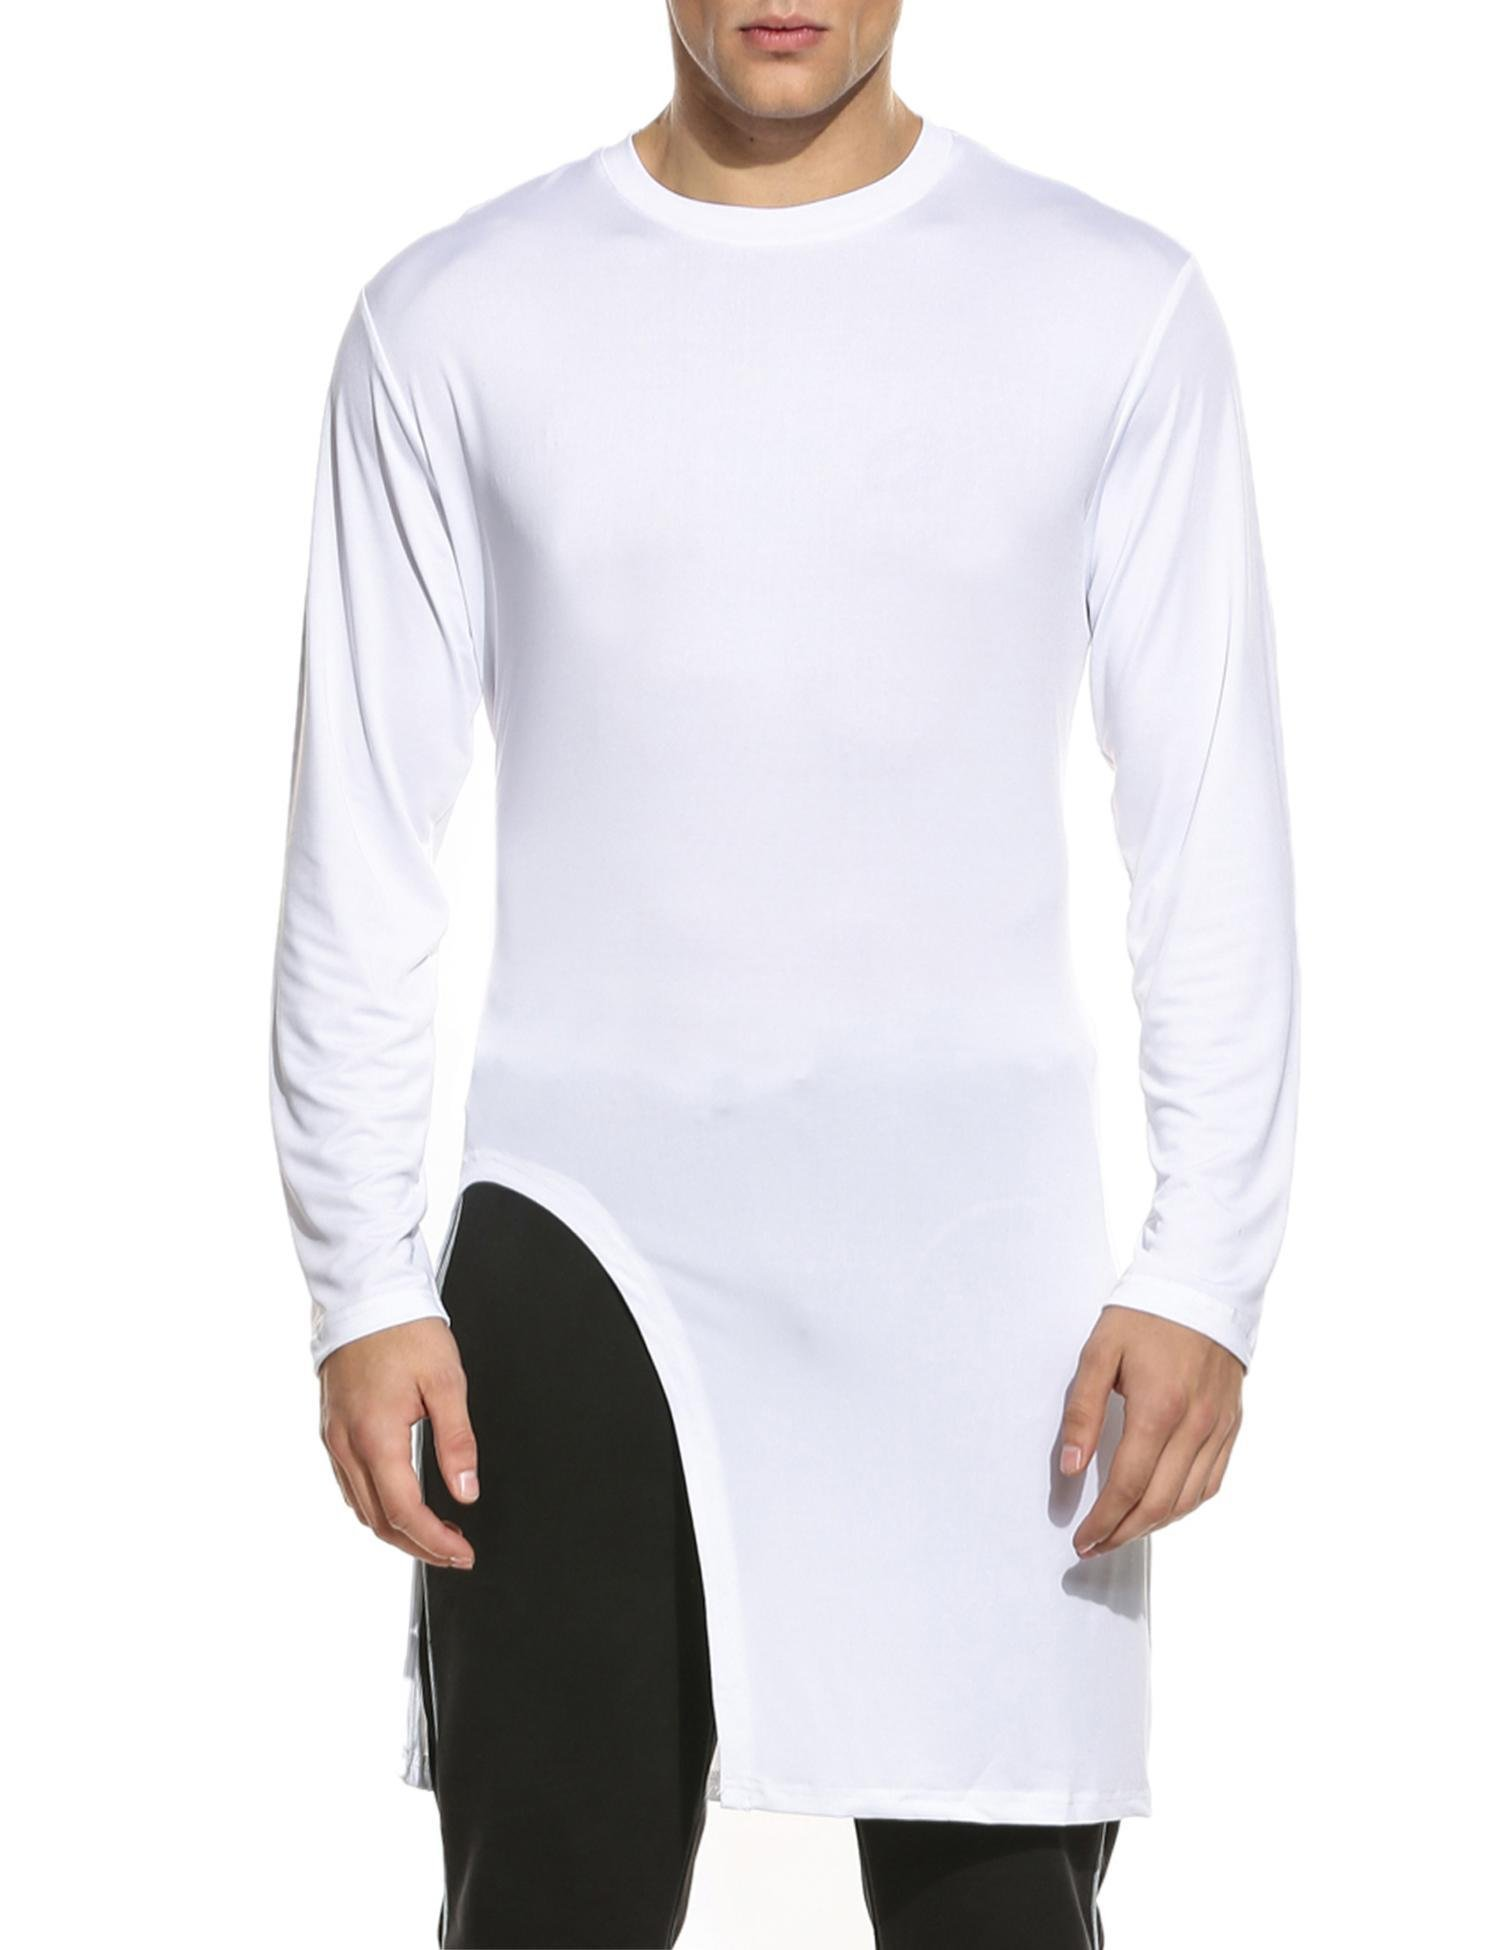 JINIDU Men's Fashion Long Hem Crewneck Slim Fit Long Sleeve Pullover T Shirt